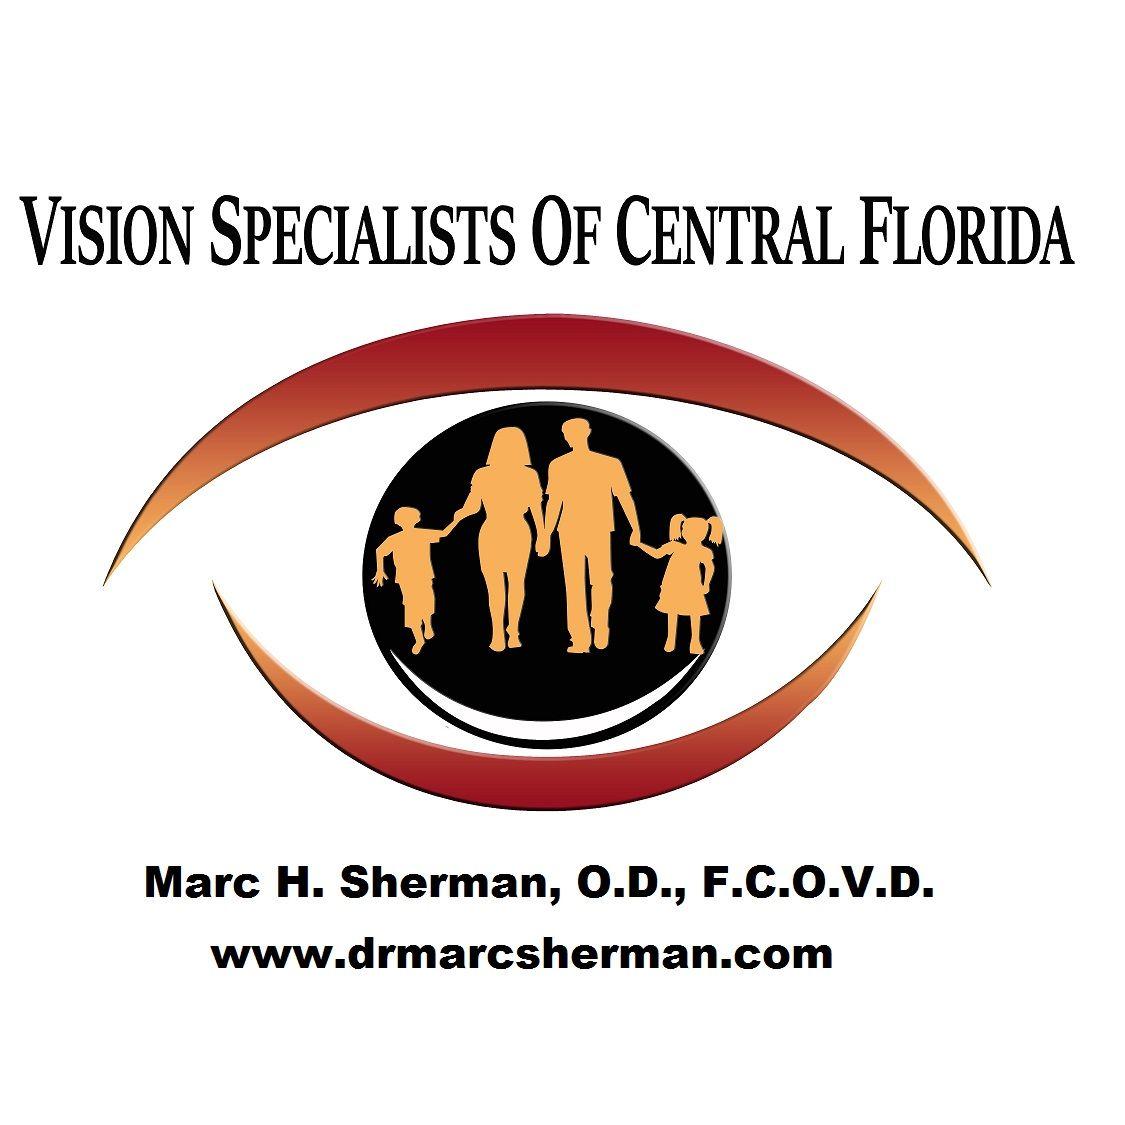 Marc H. Sherman, O.D. F.C.O.V.D. Logo Moving to florida